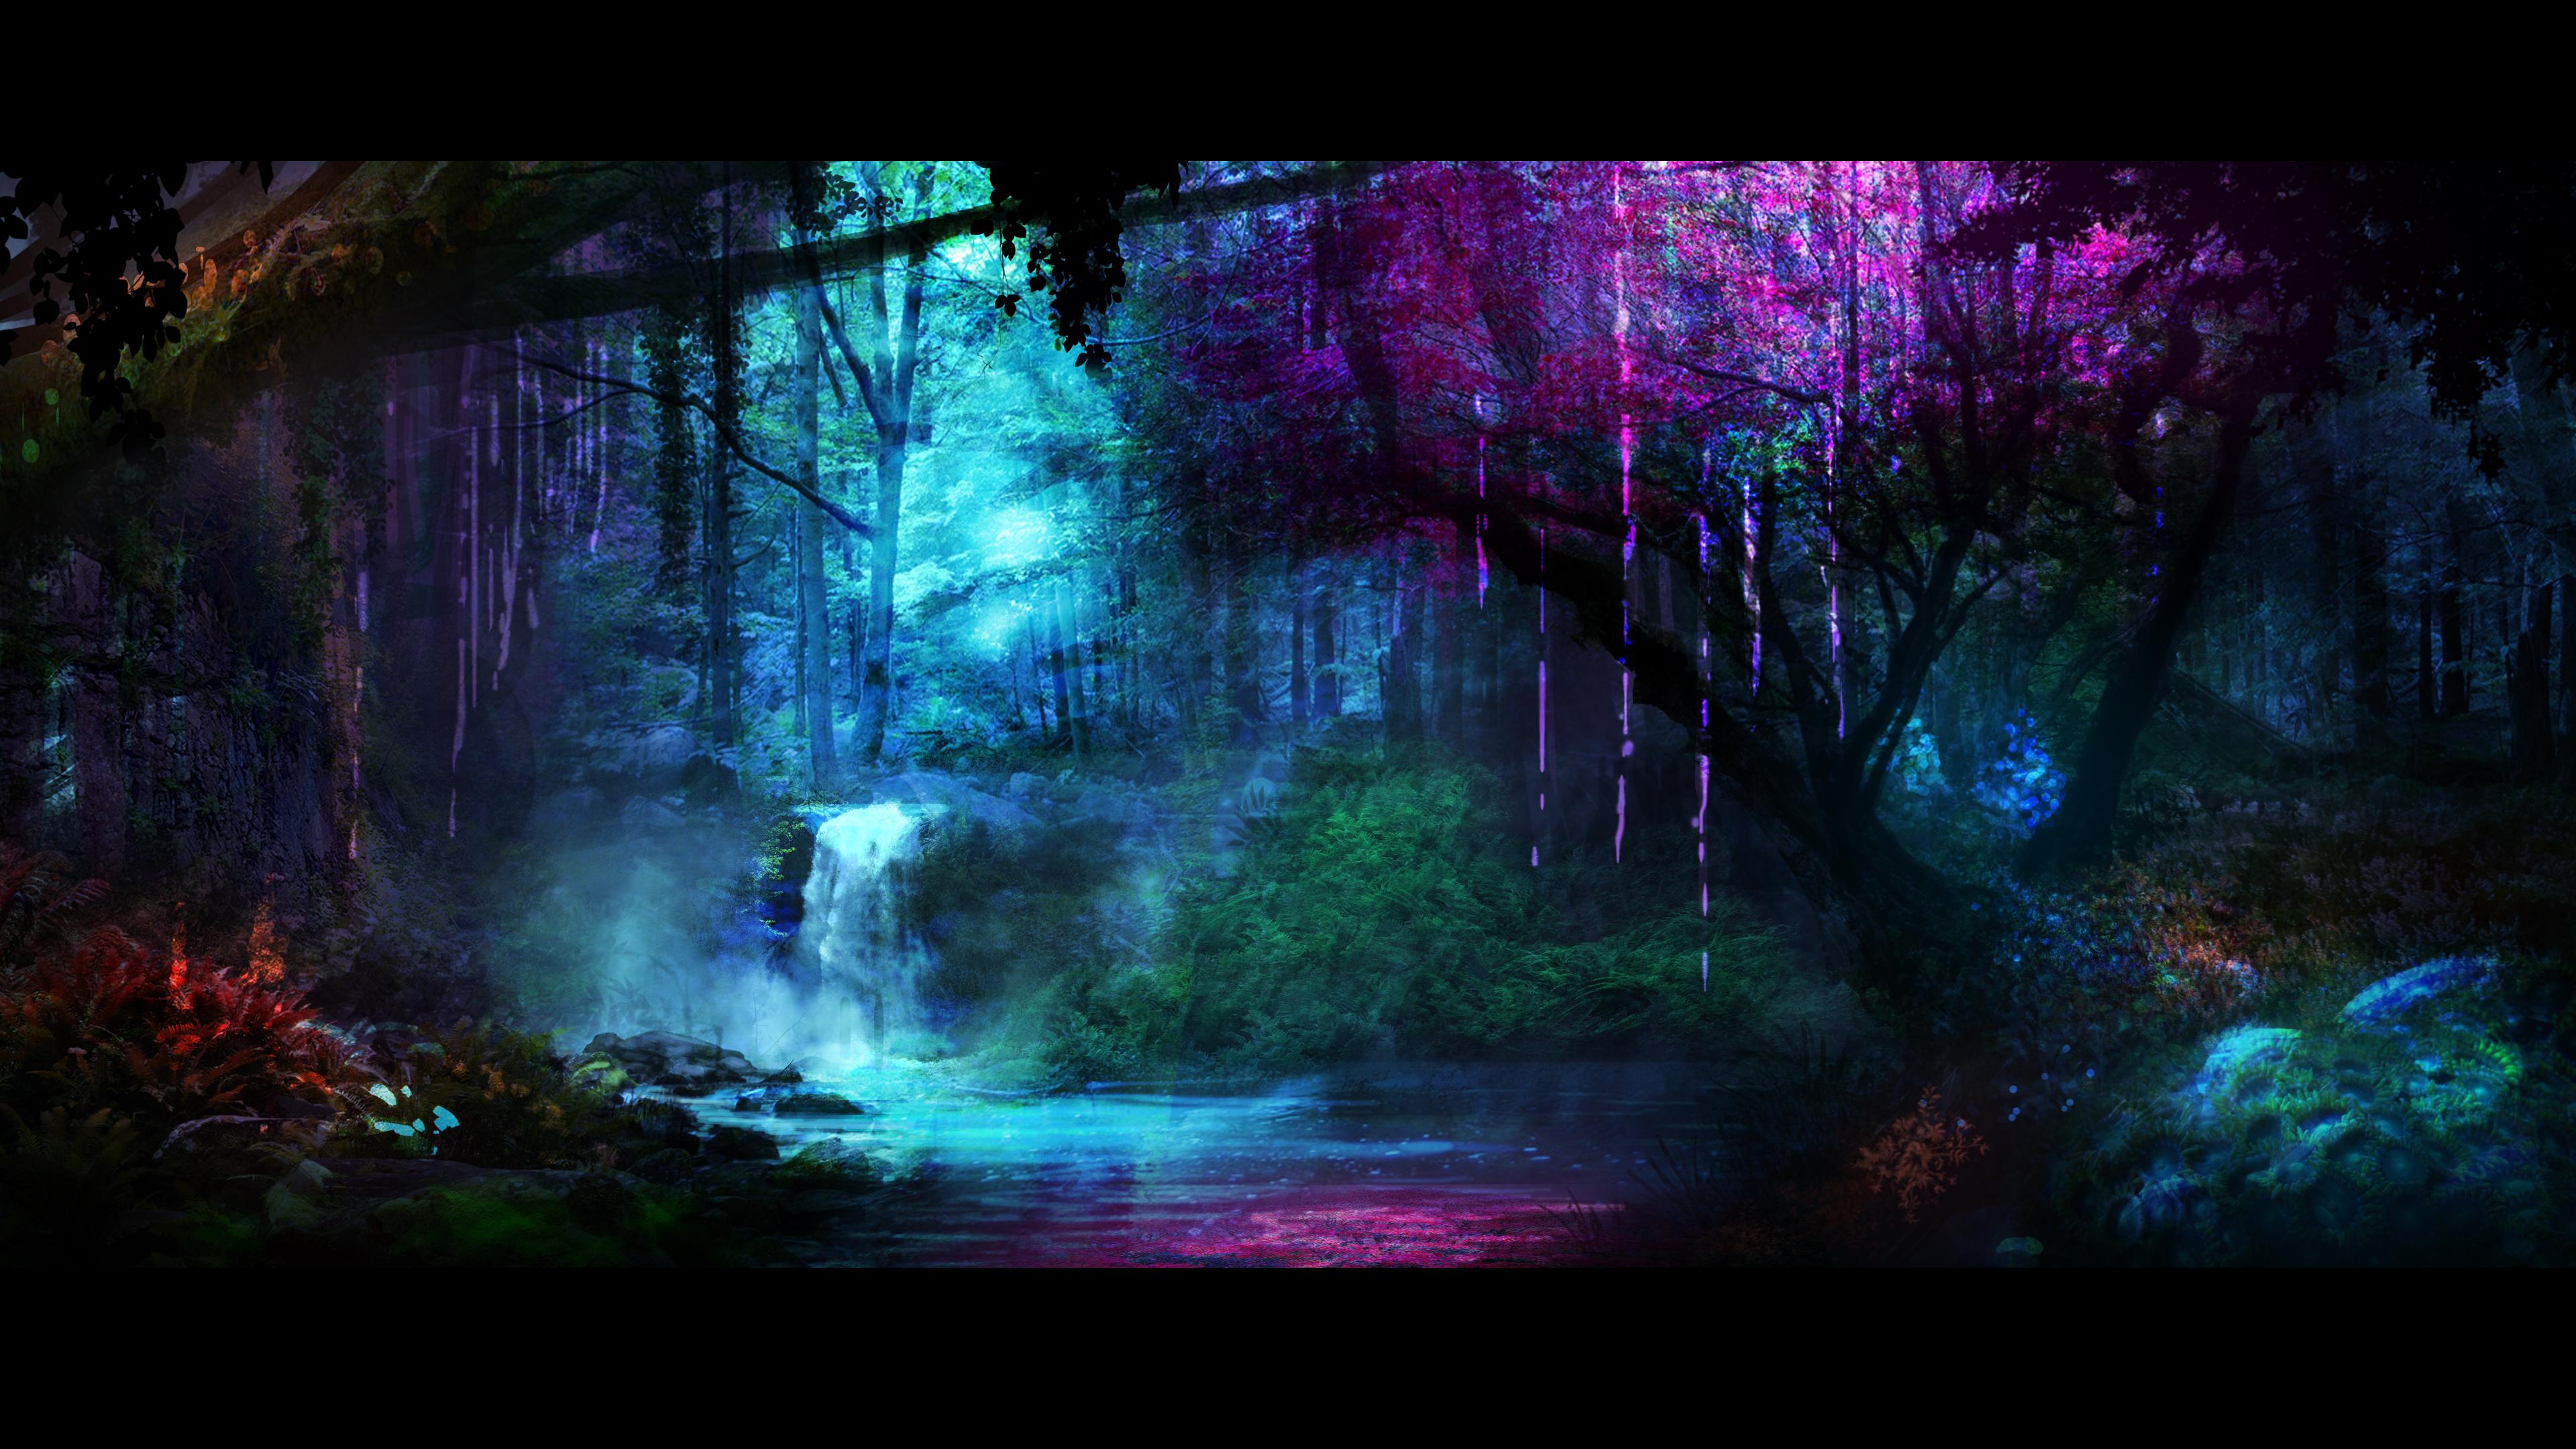 Avatar Concept Art By Willroberts04 On Deviantart